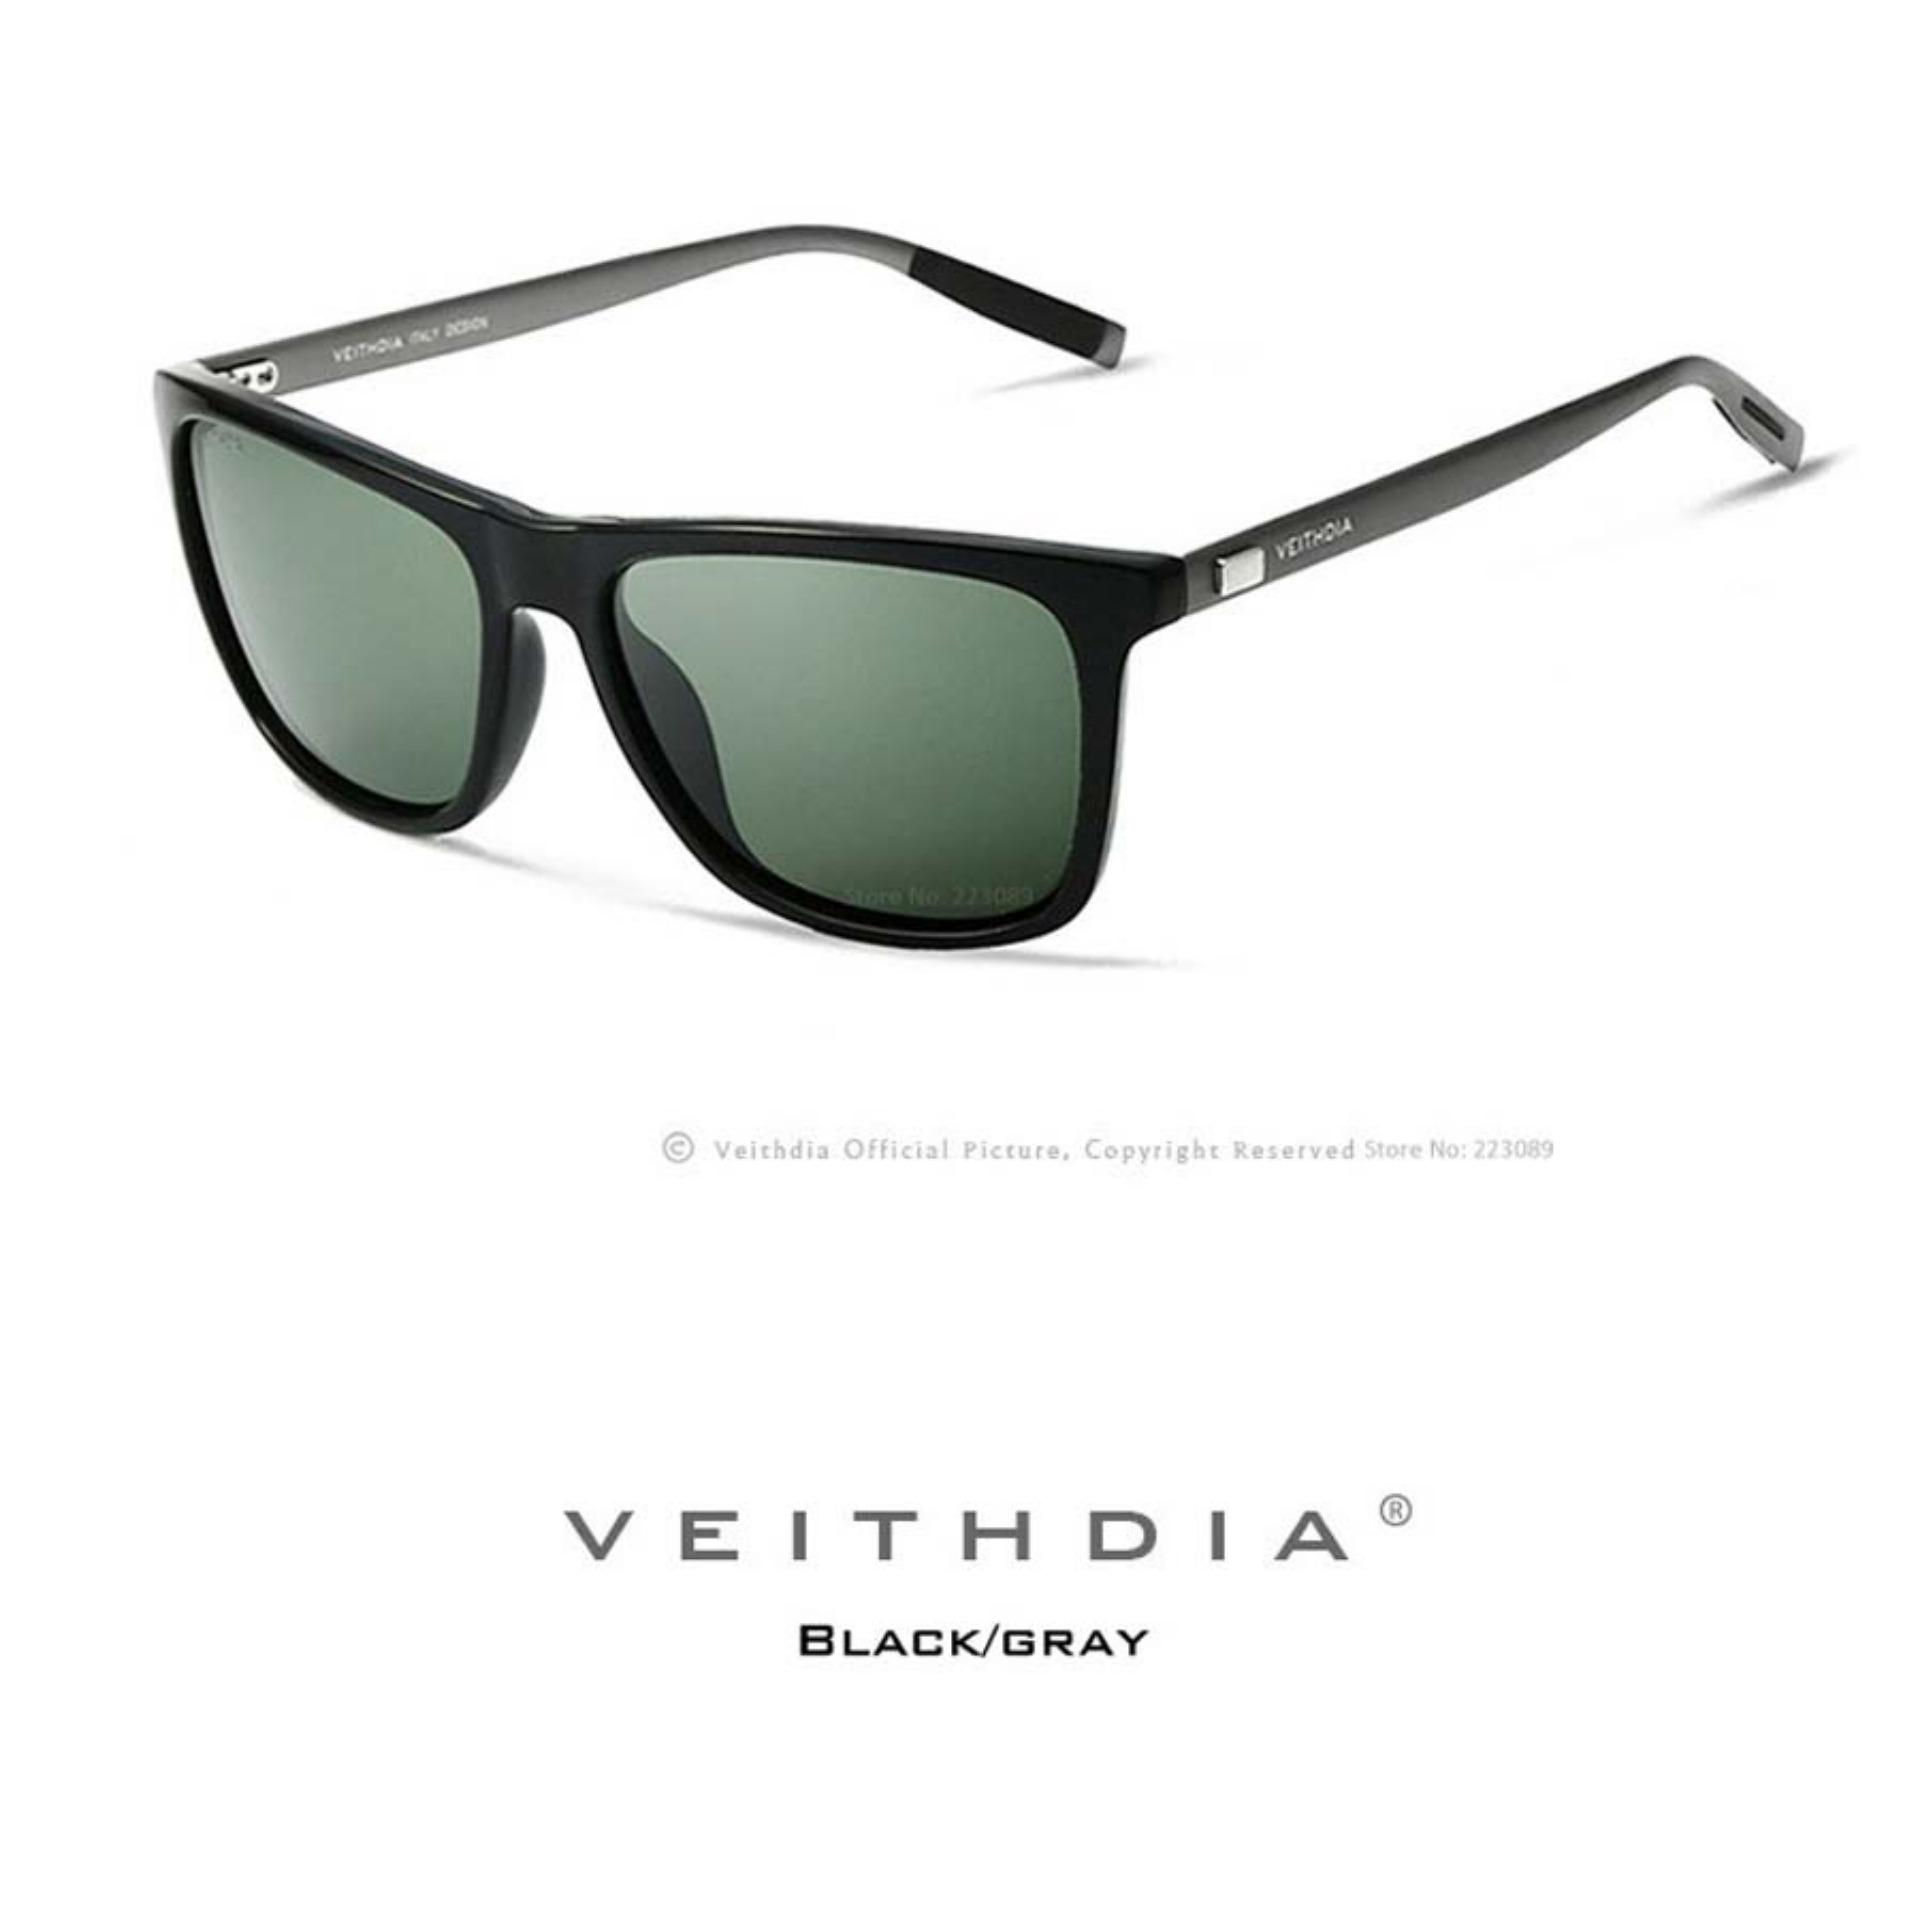 Spesifikasi Veithdia 6108 Kacamata Hitam Pria Aluminium Sport Dan Travel Elegant Mirrored Uv400 Polarized Sunglasses Veithdia